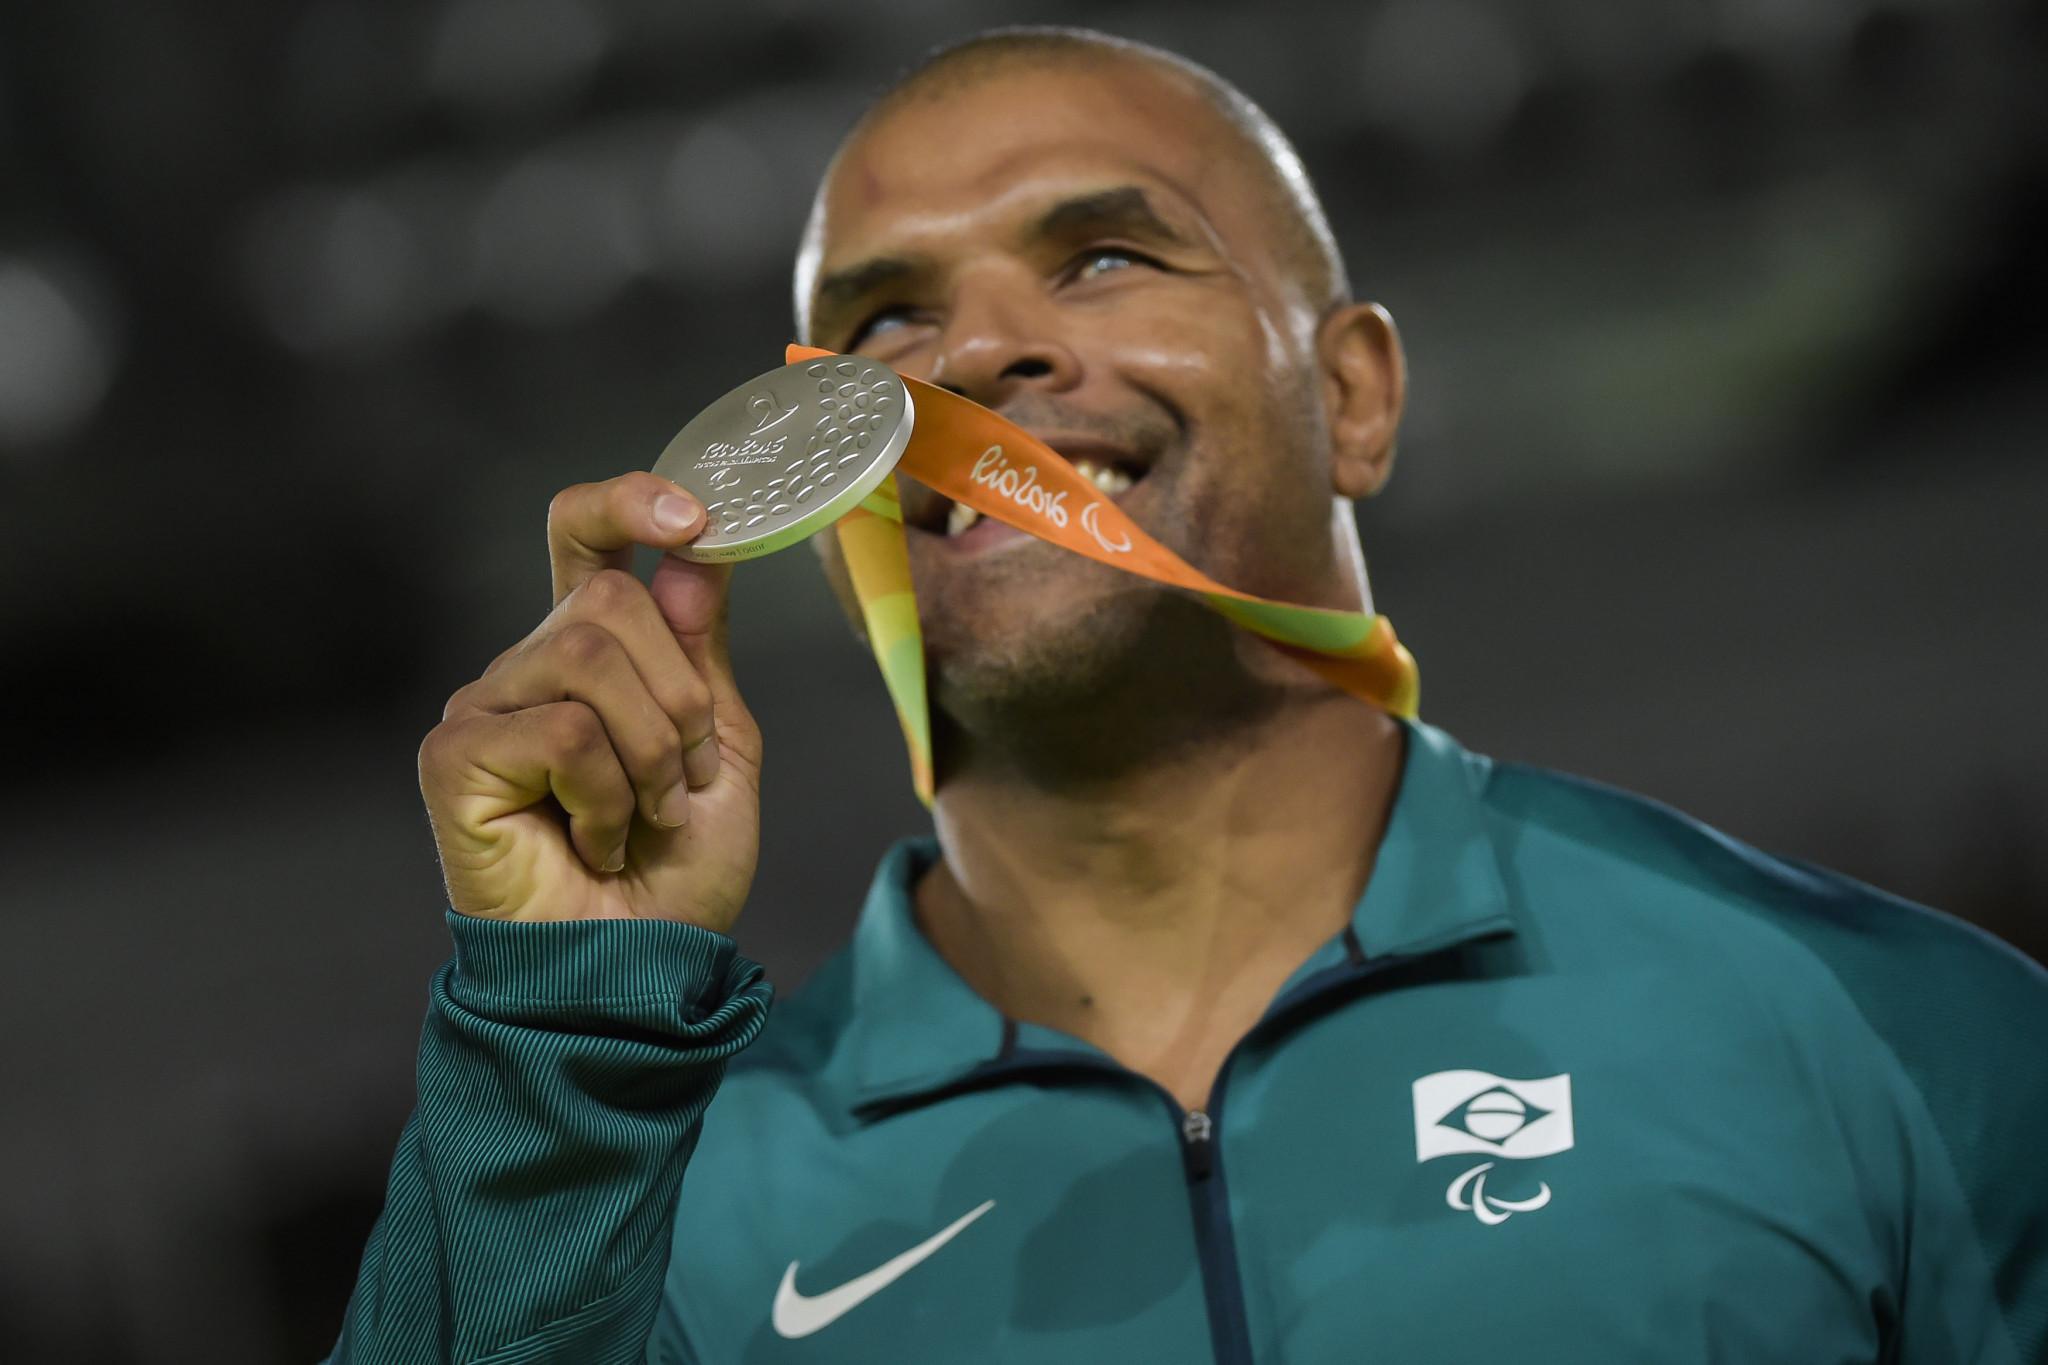 Judo star Tenório headlines Brazil's squad for Tokyo 2020 Paralympics